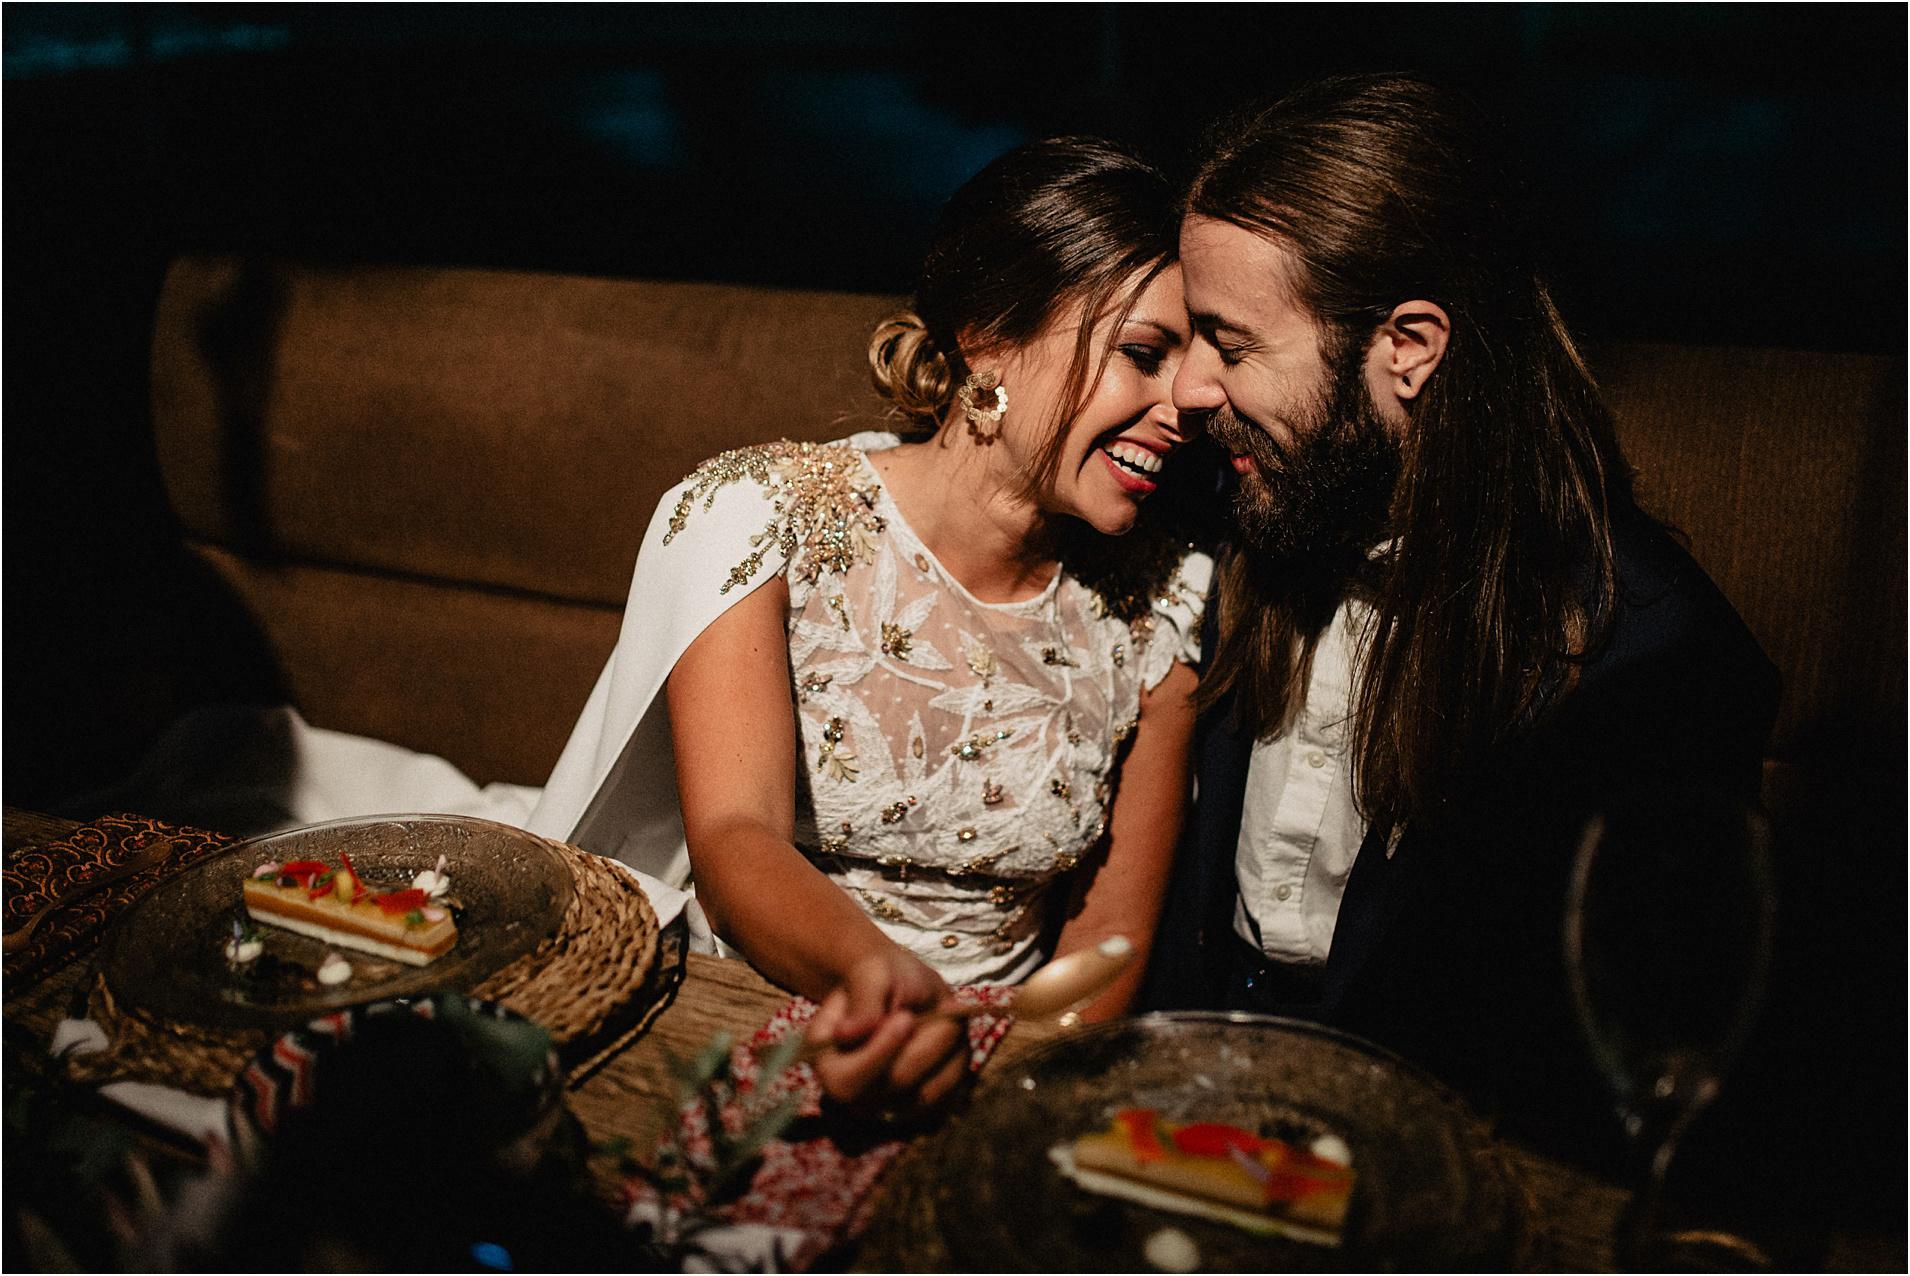 Fotografía y video en Palacio de Arbaisenea Bodas San Sebastián Donostia Guipuzcoa - Finca Arbaisenea by Maher Catering Wedding films and photography-58.jpg